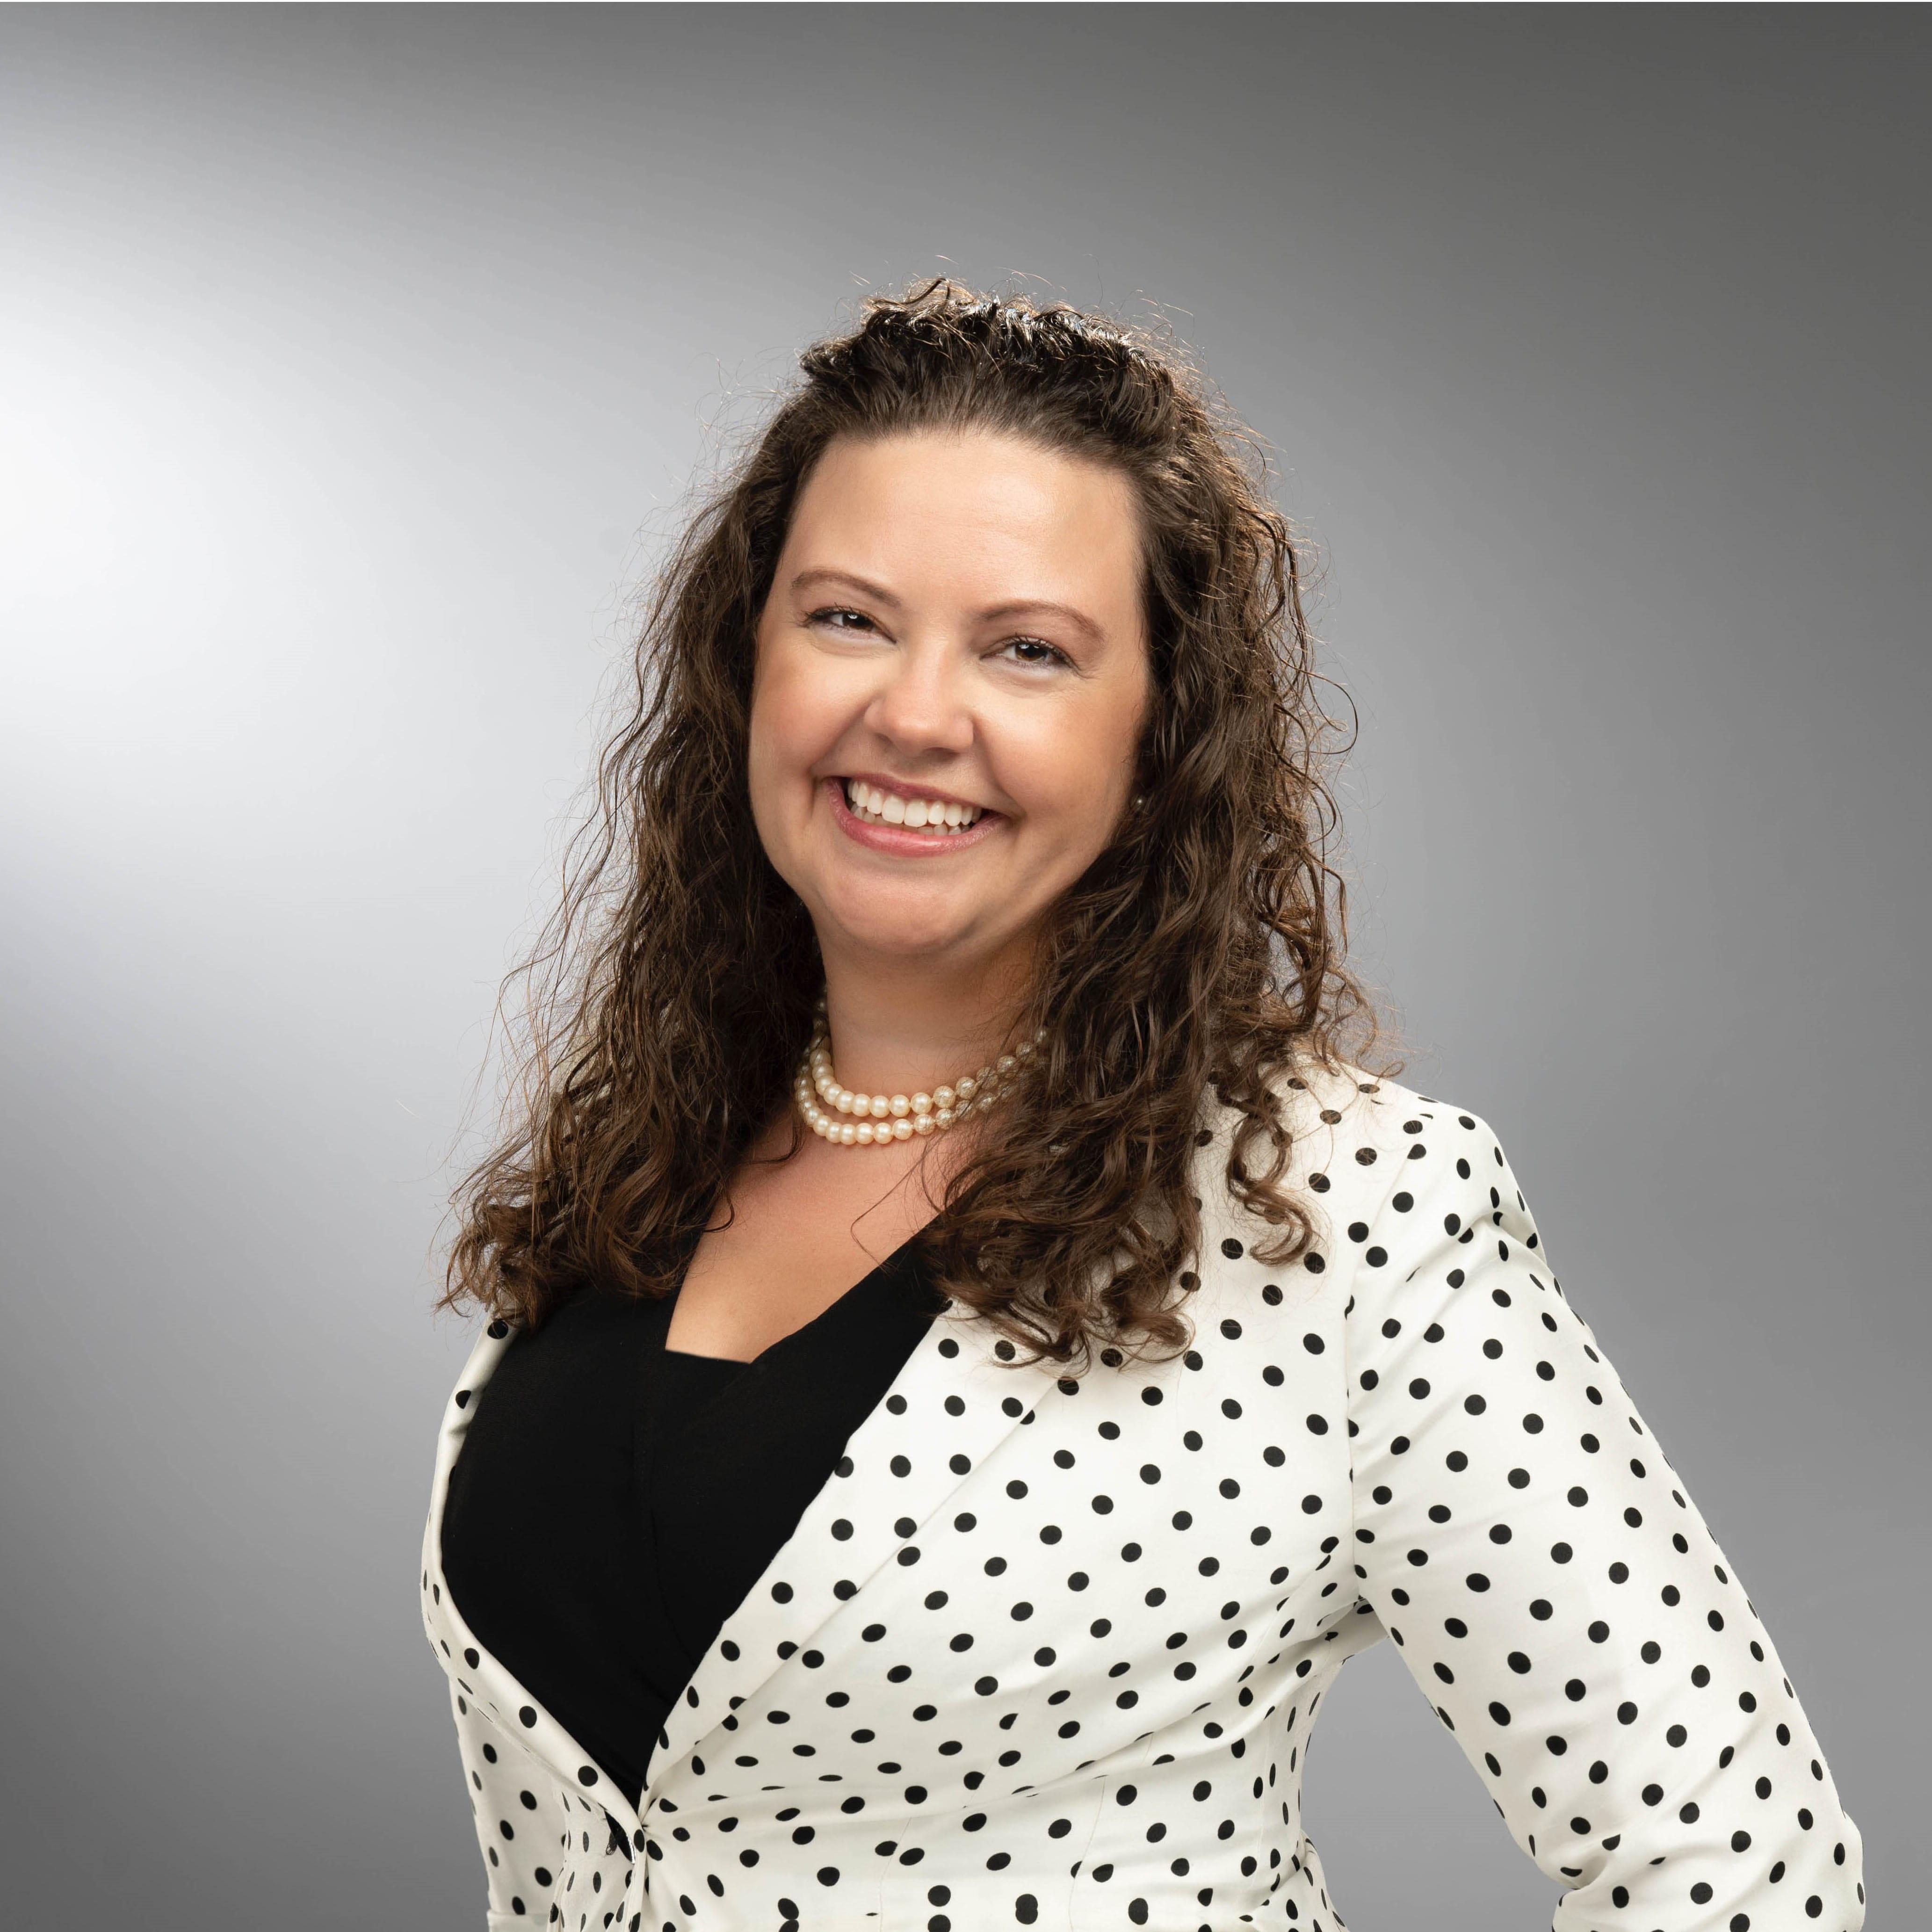 Headshot of Christina Miller